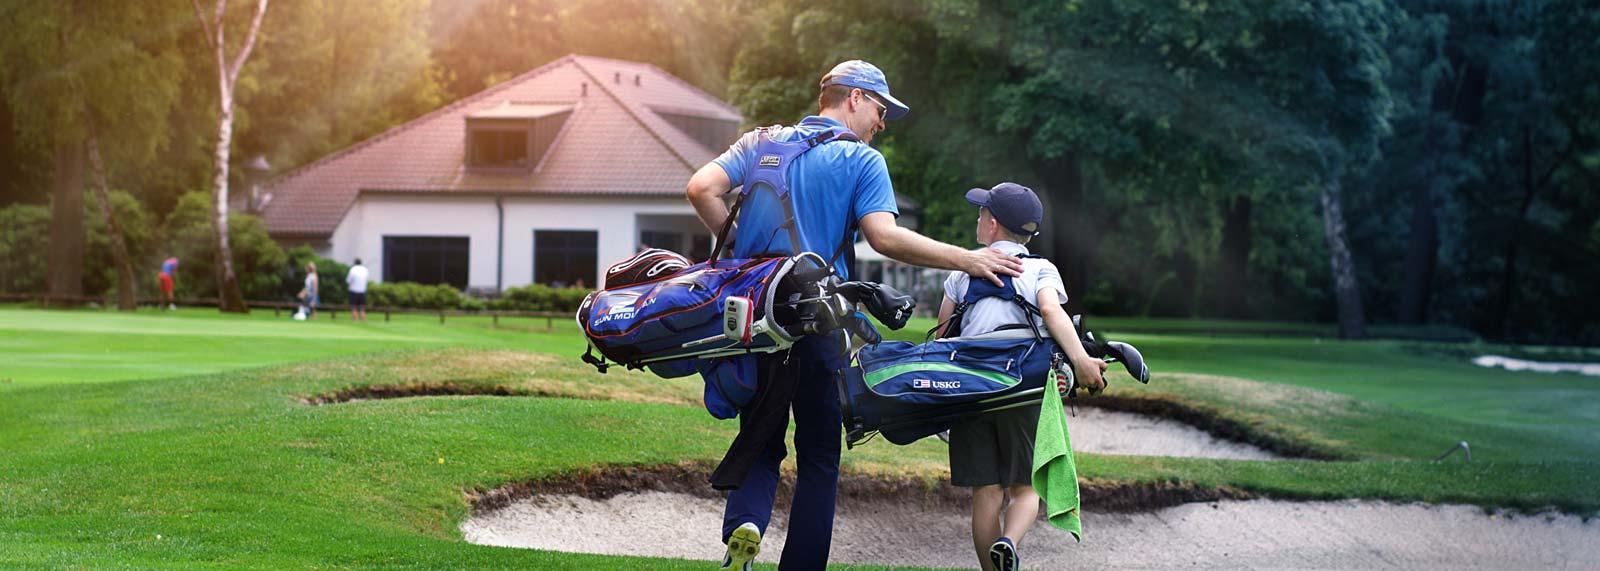 Golf- & Landclub, Familie